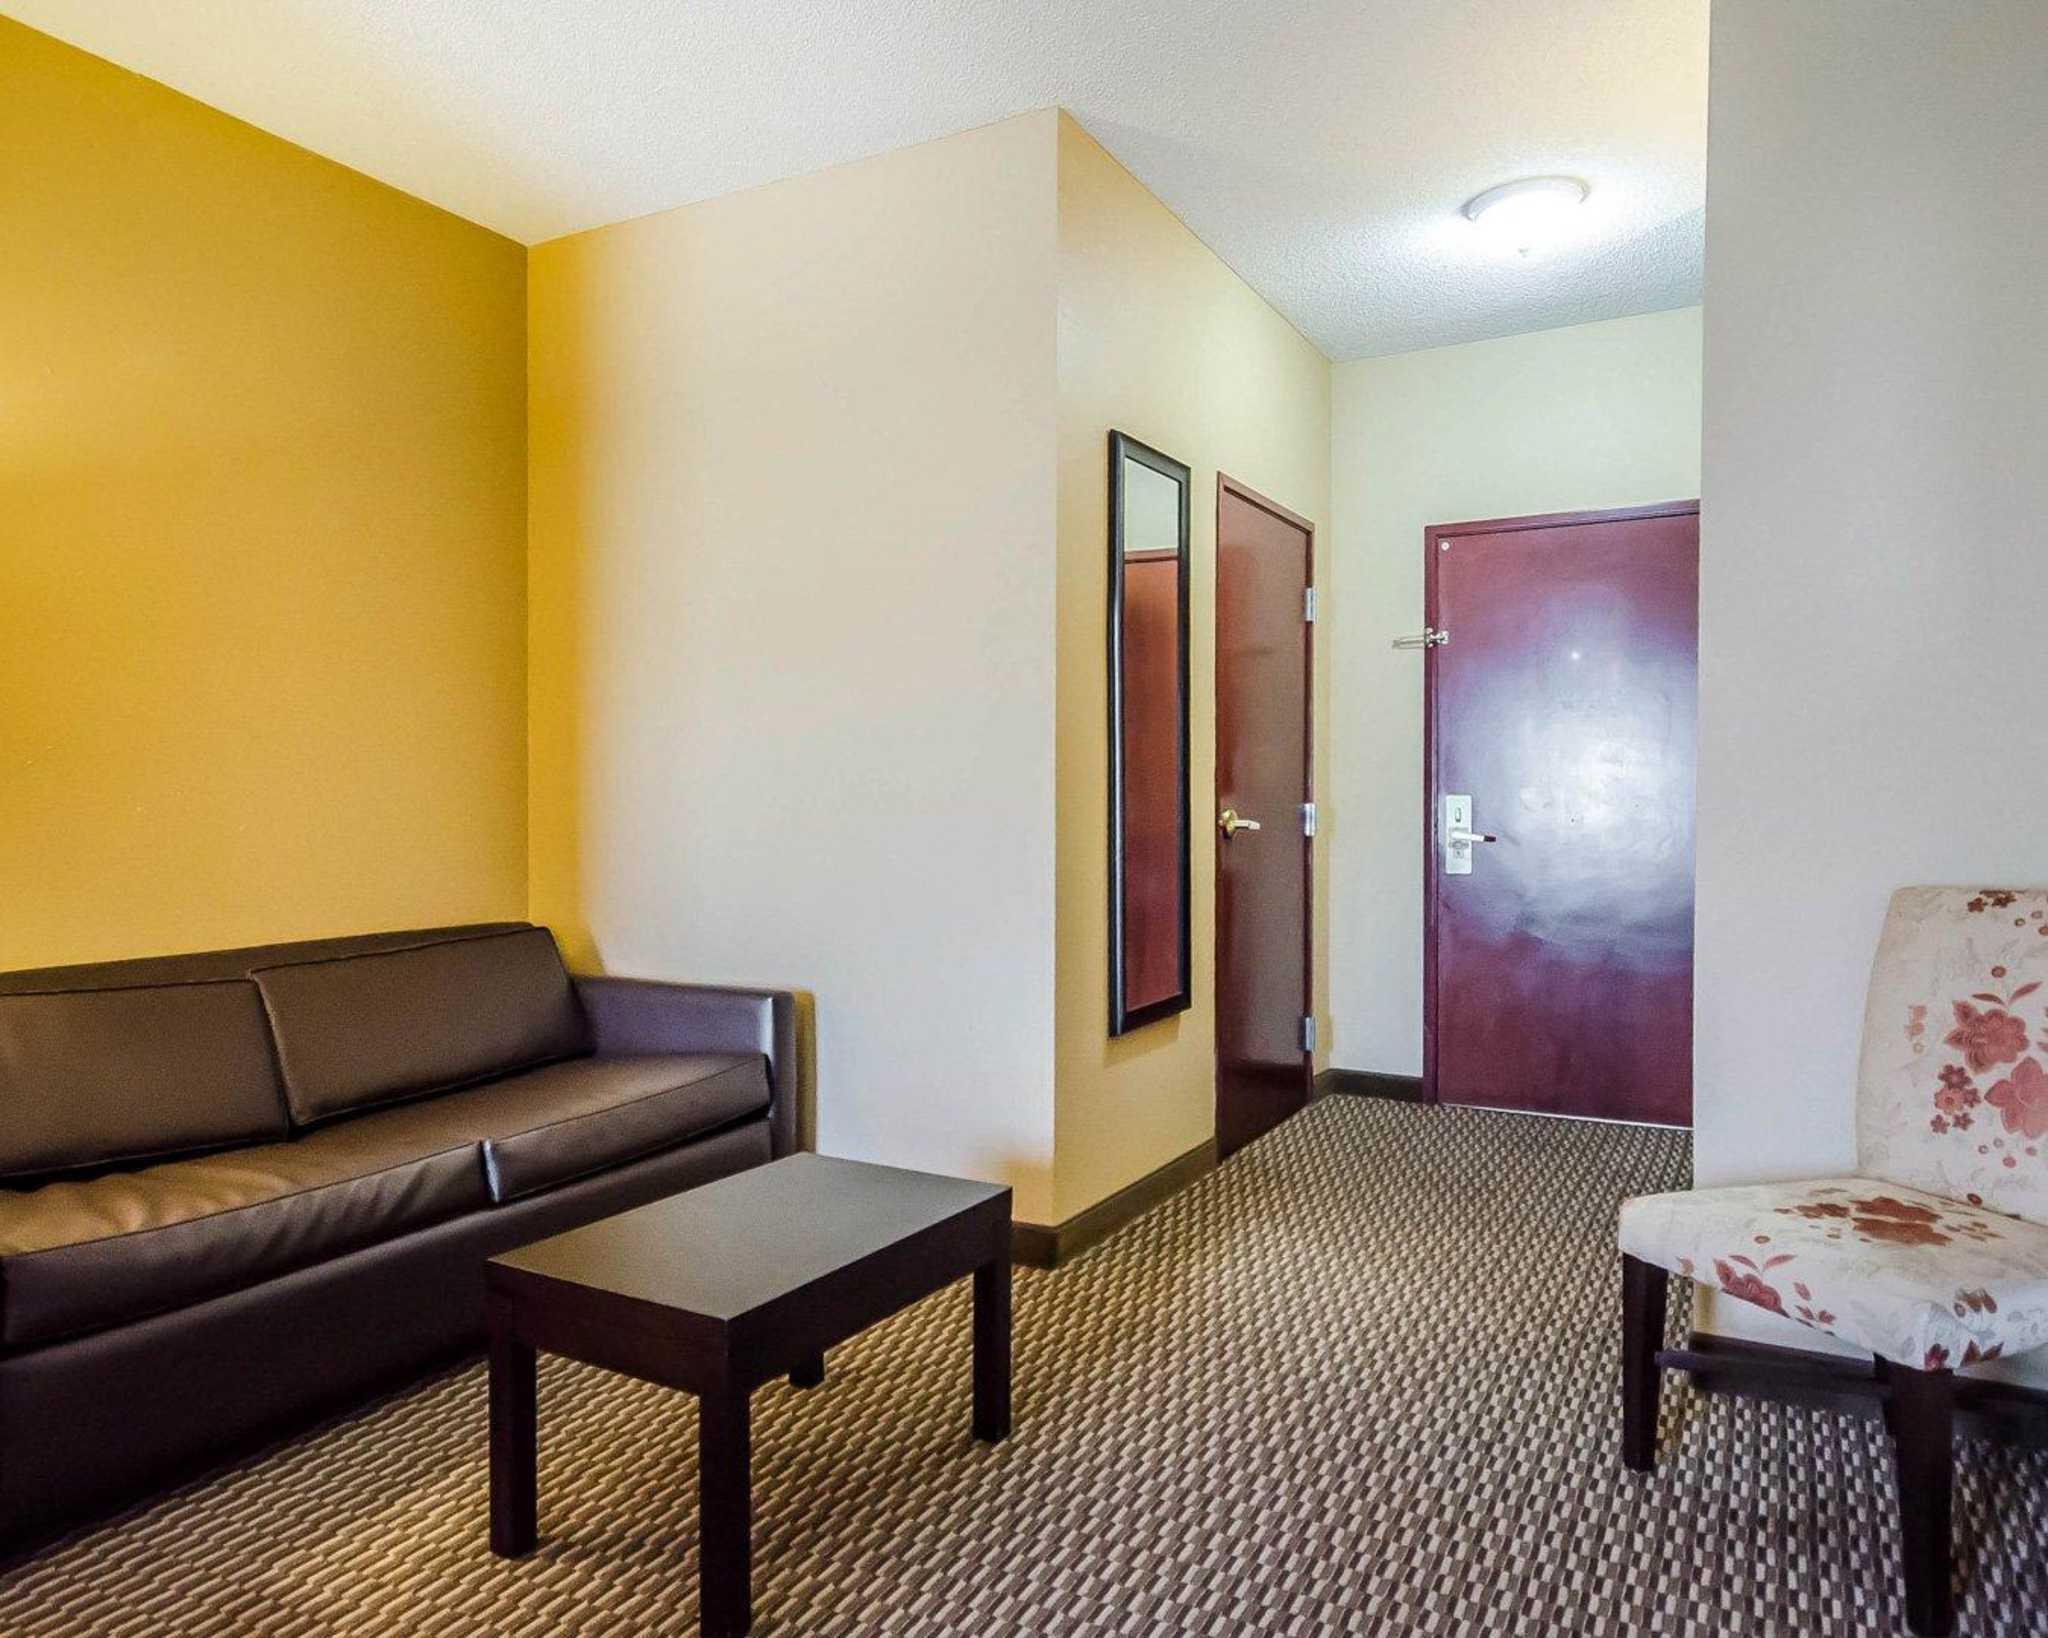 Quality Suites image 22